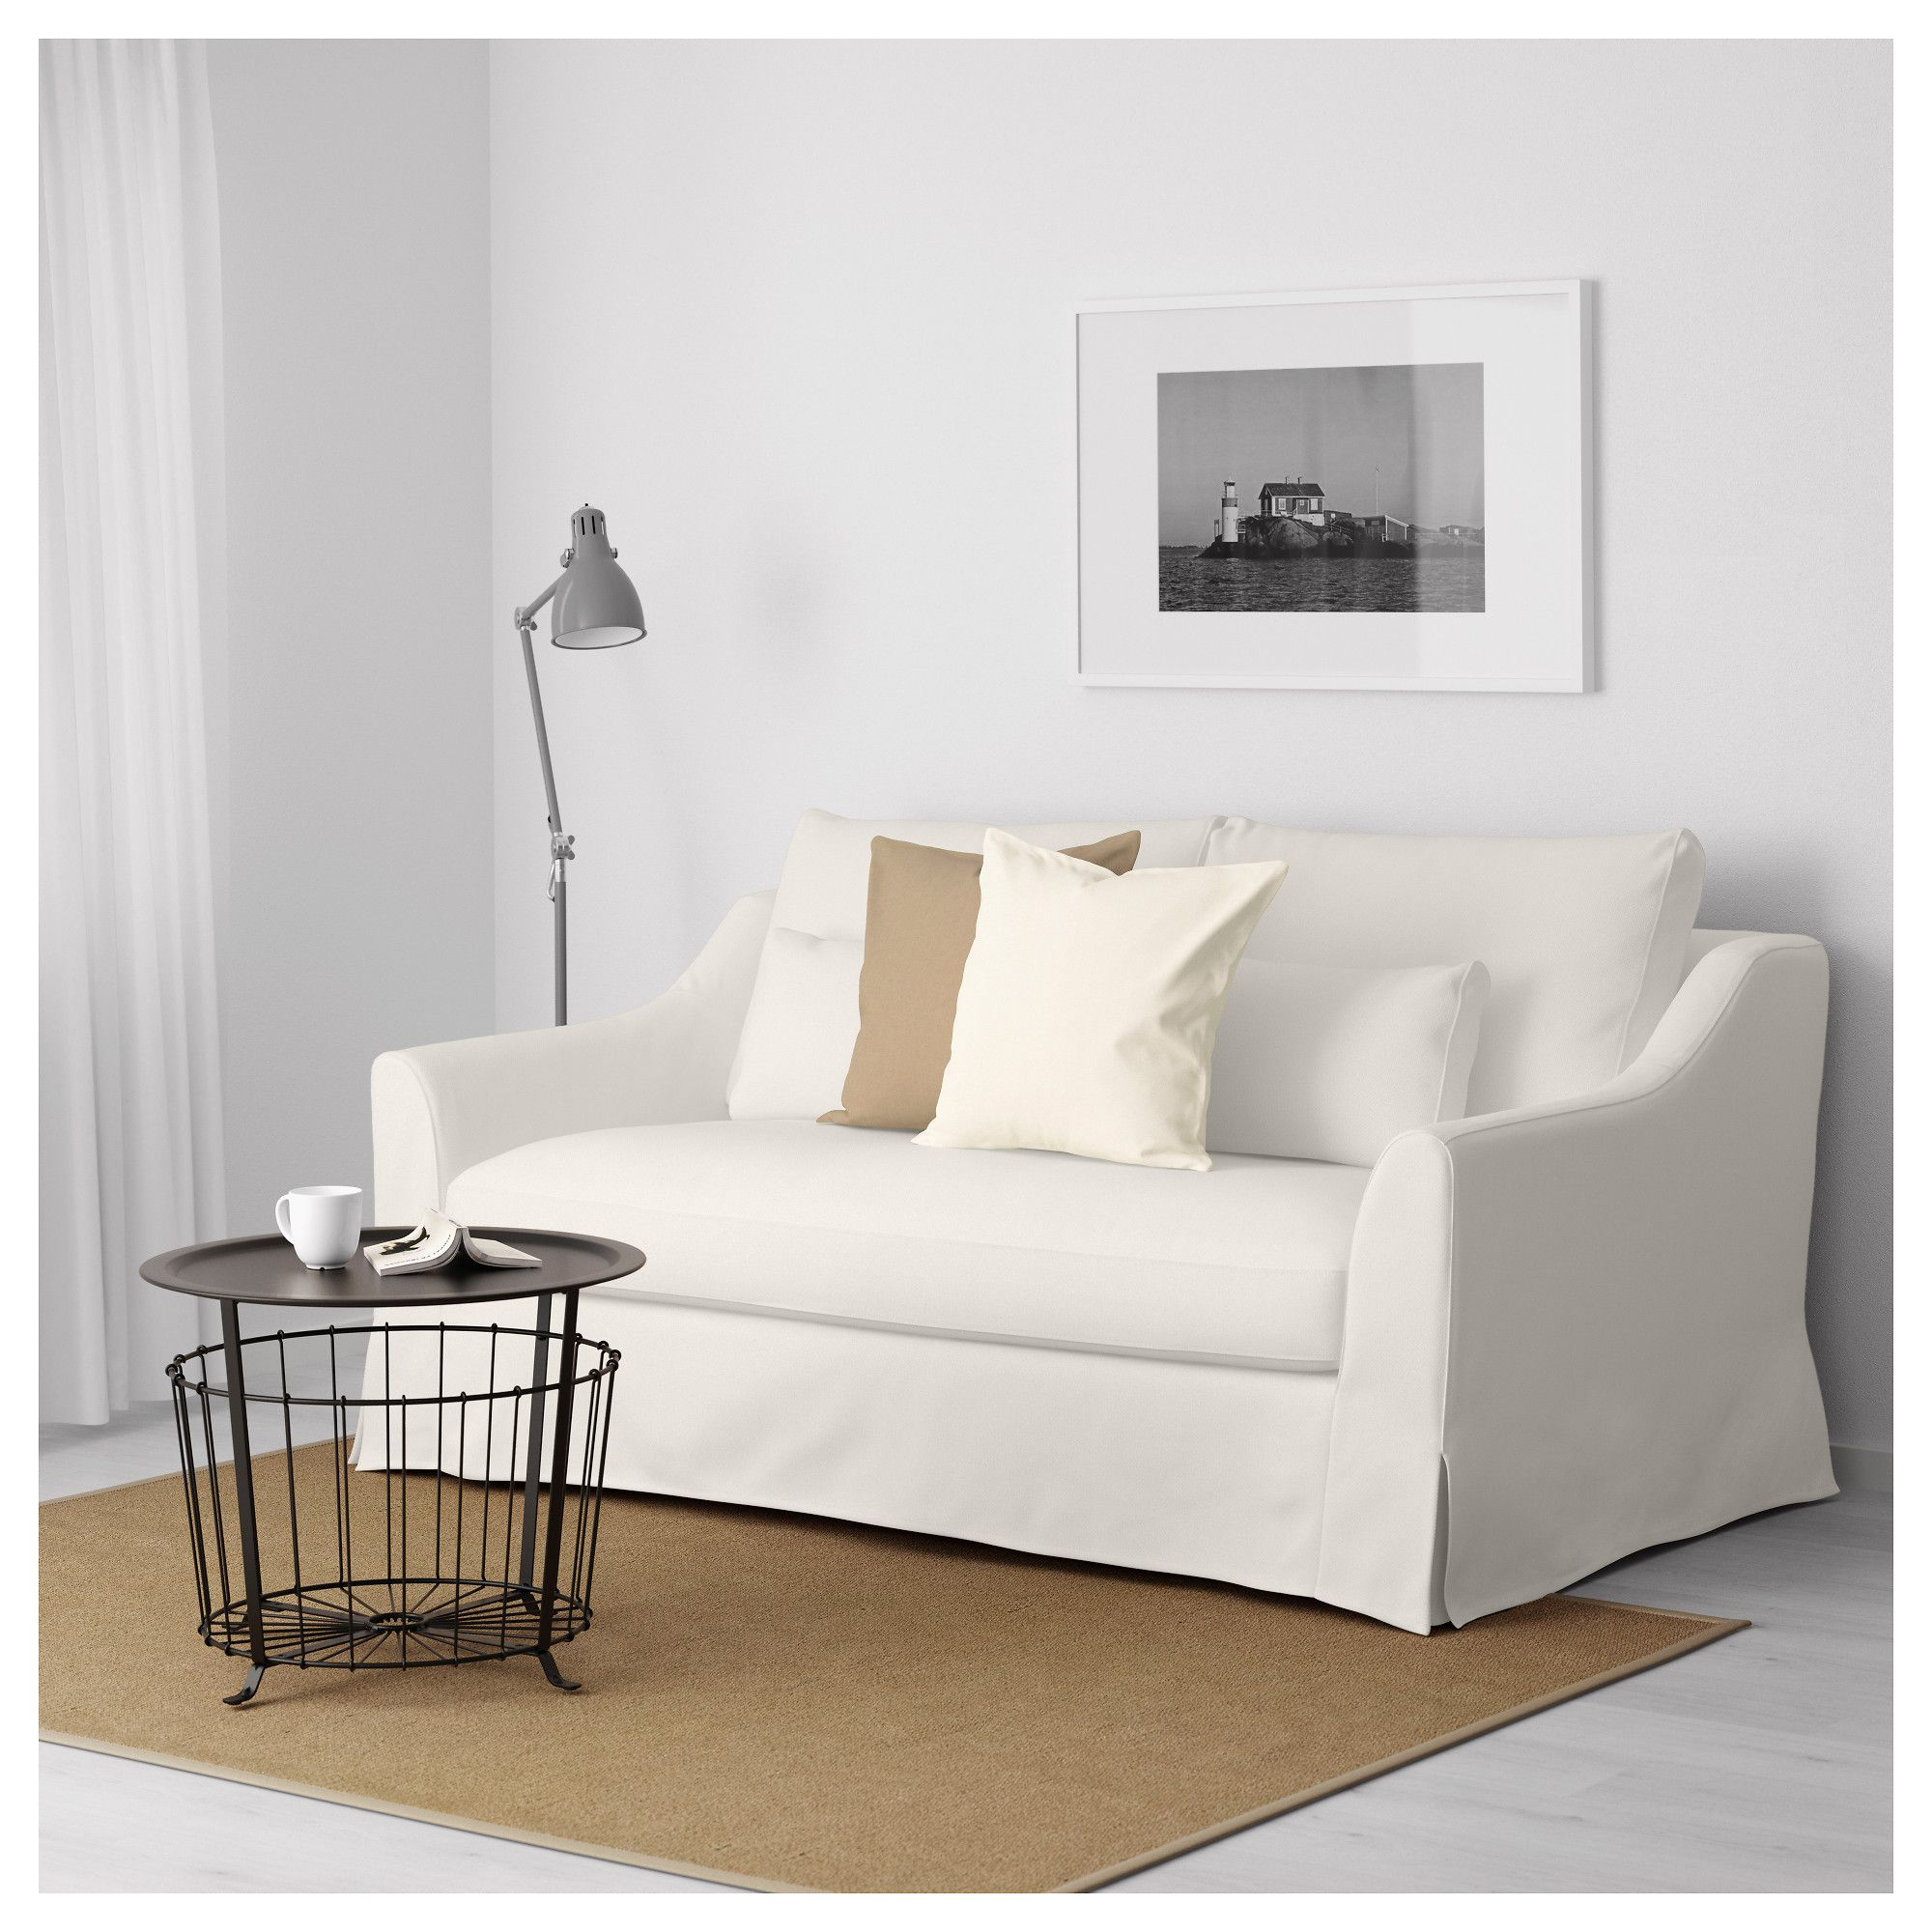 sofa 10 year guarantee with lounge chair fÄrlÖv 2 seat flodafors white furniture pinterest